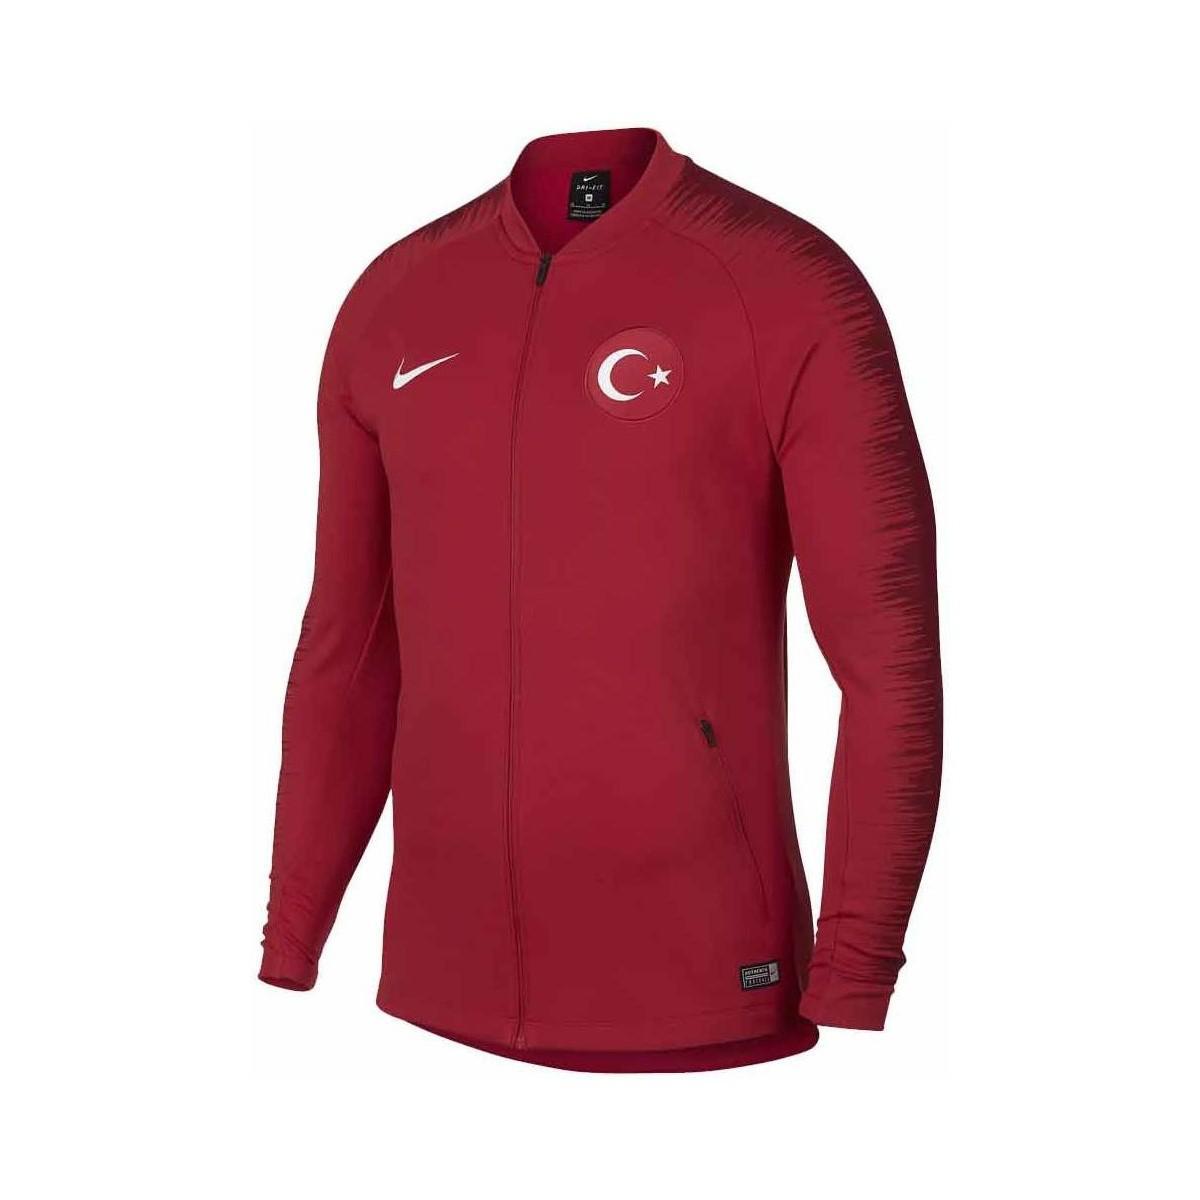 d6332d939adde Nike 2018-2019 Turkey Anthem Jacket Men's Polo Shirt In Red for men